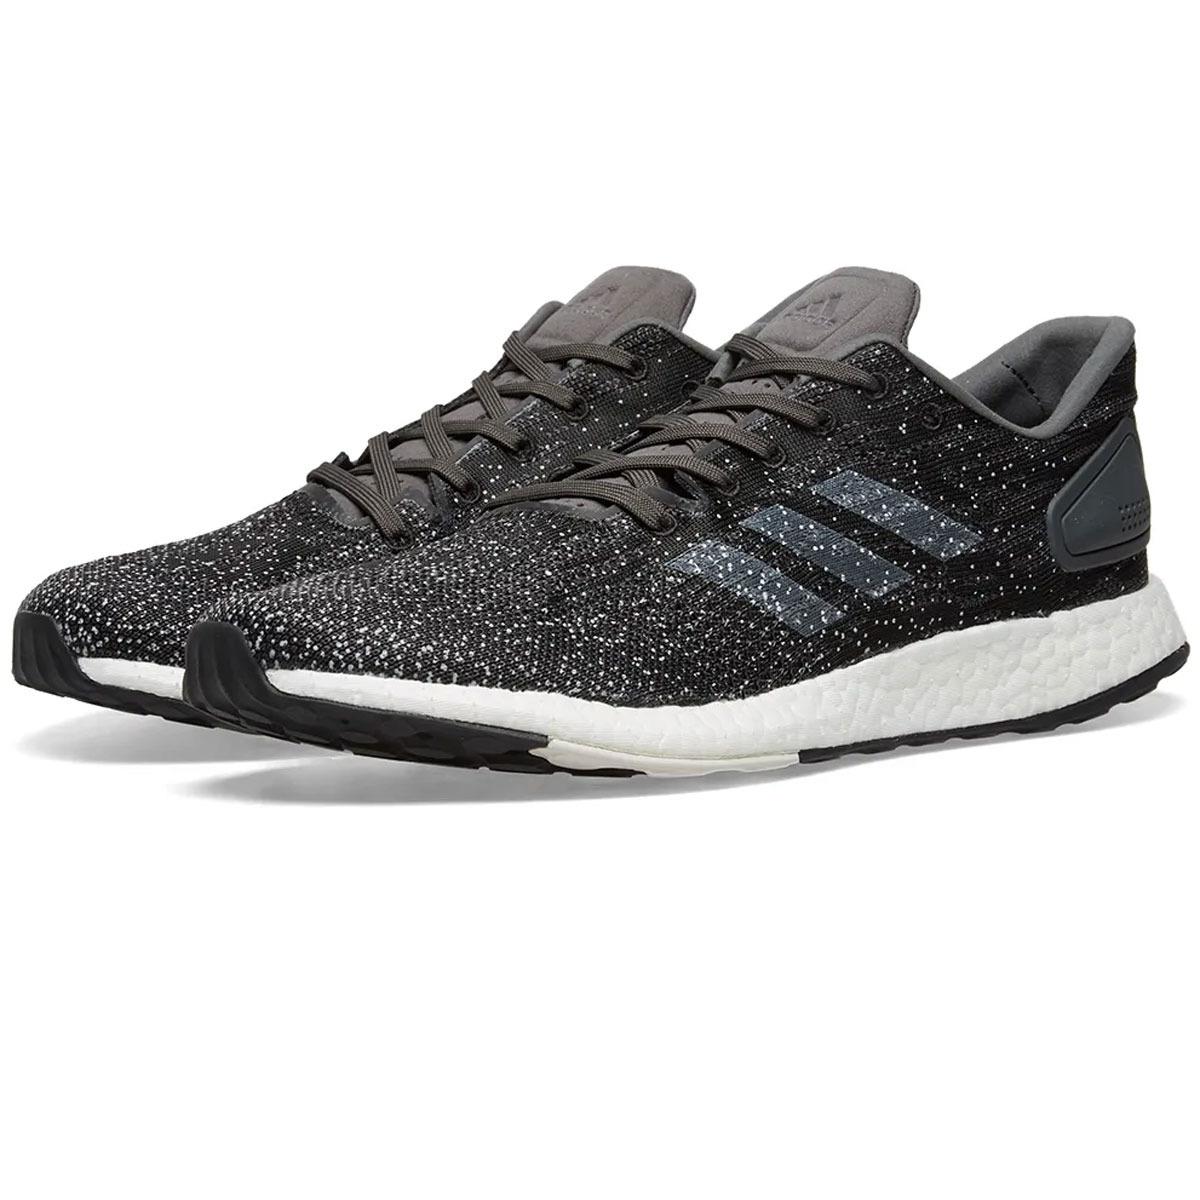 Кроссовки мужские Adidas Pureboost Dpr, цвет: серый. B37787. Размер 9 (42)B37787